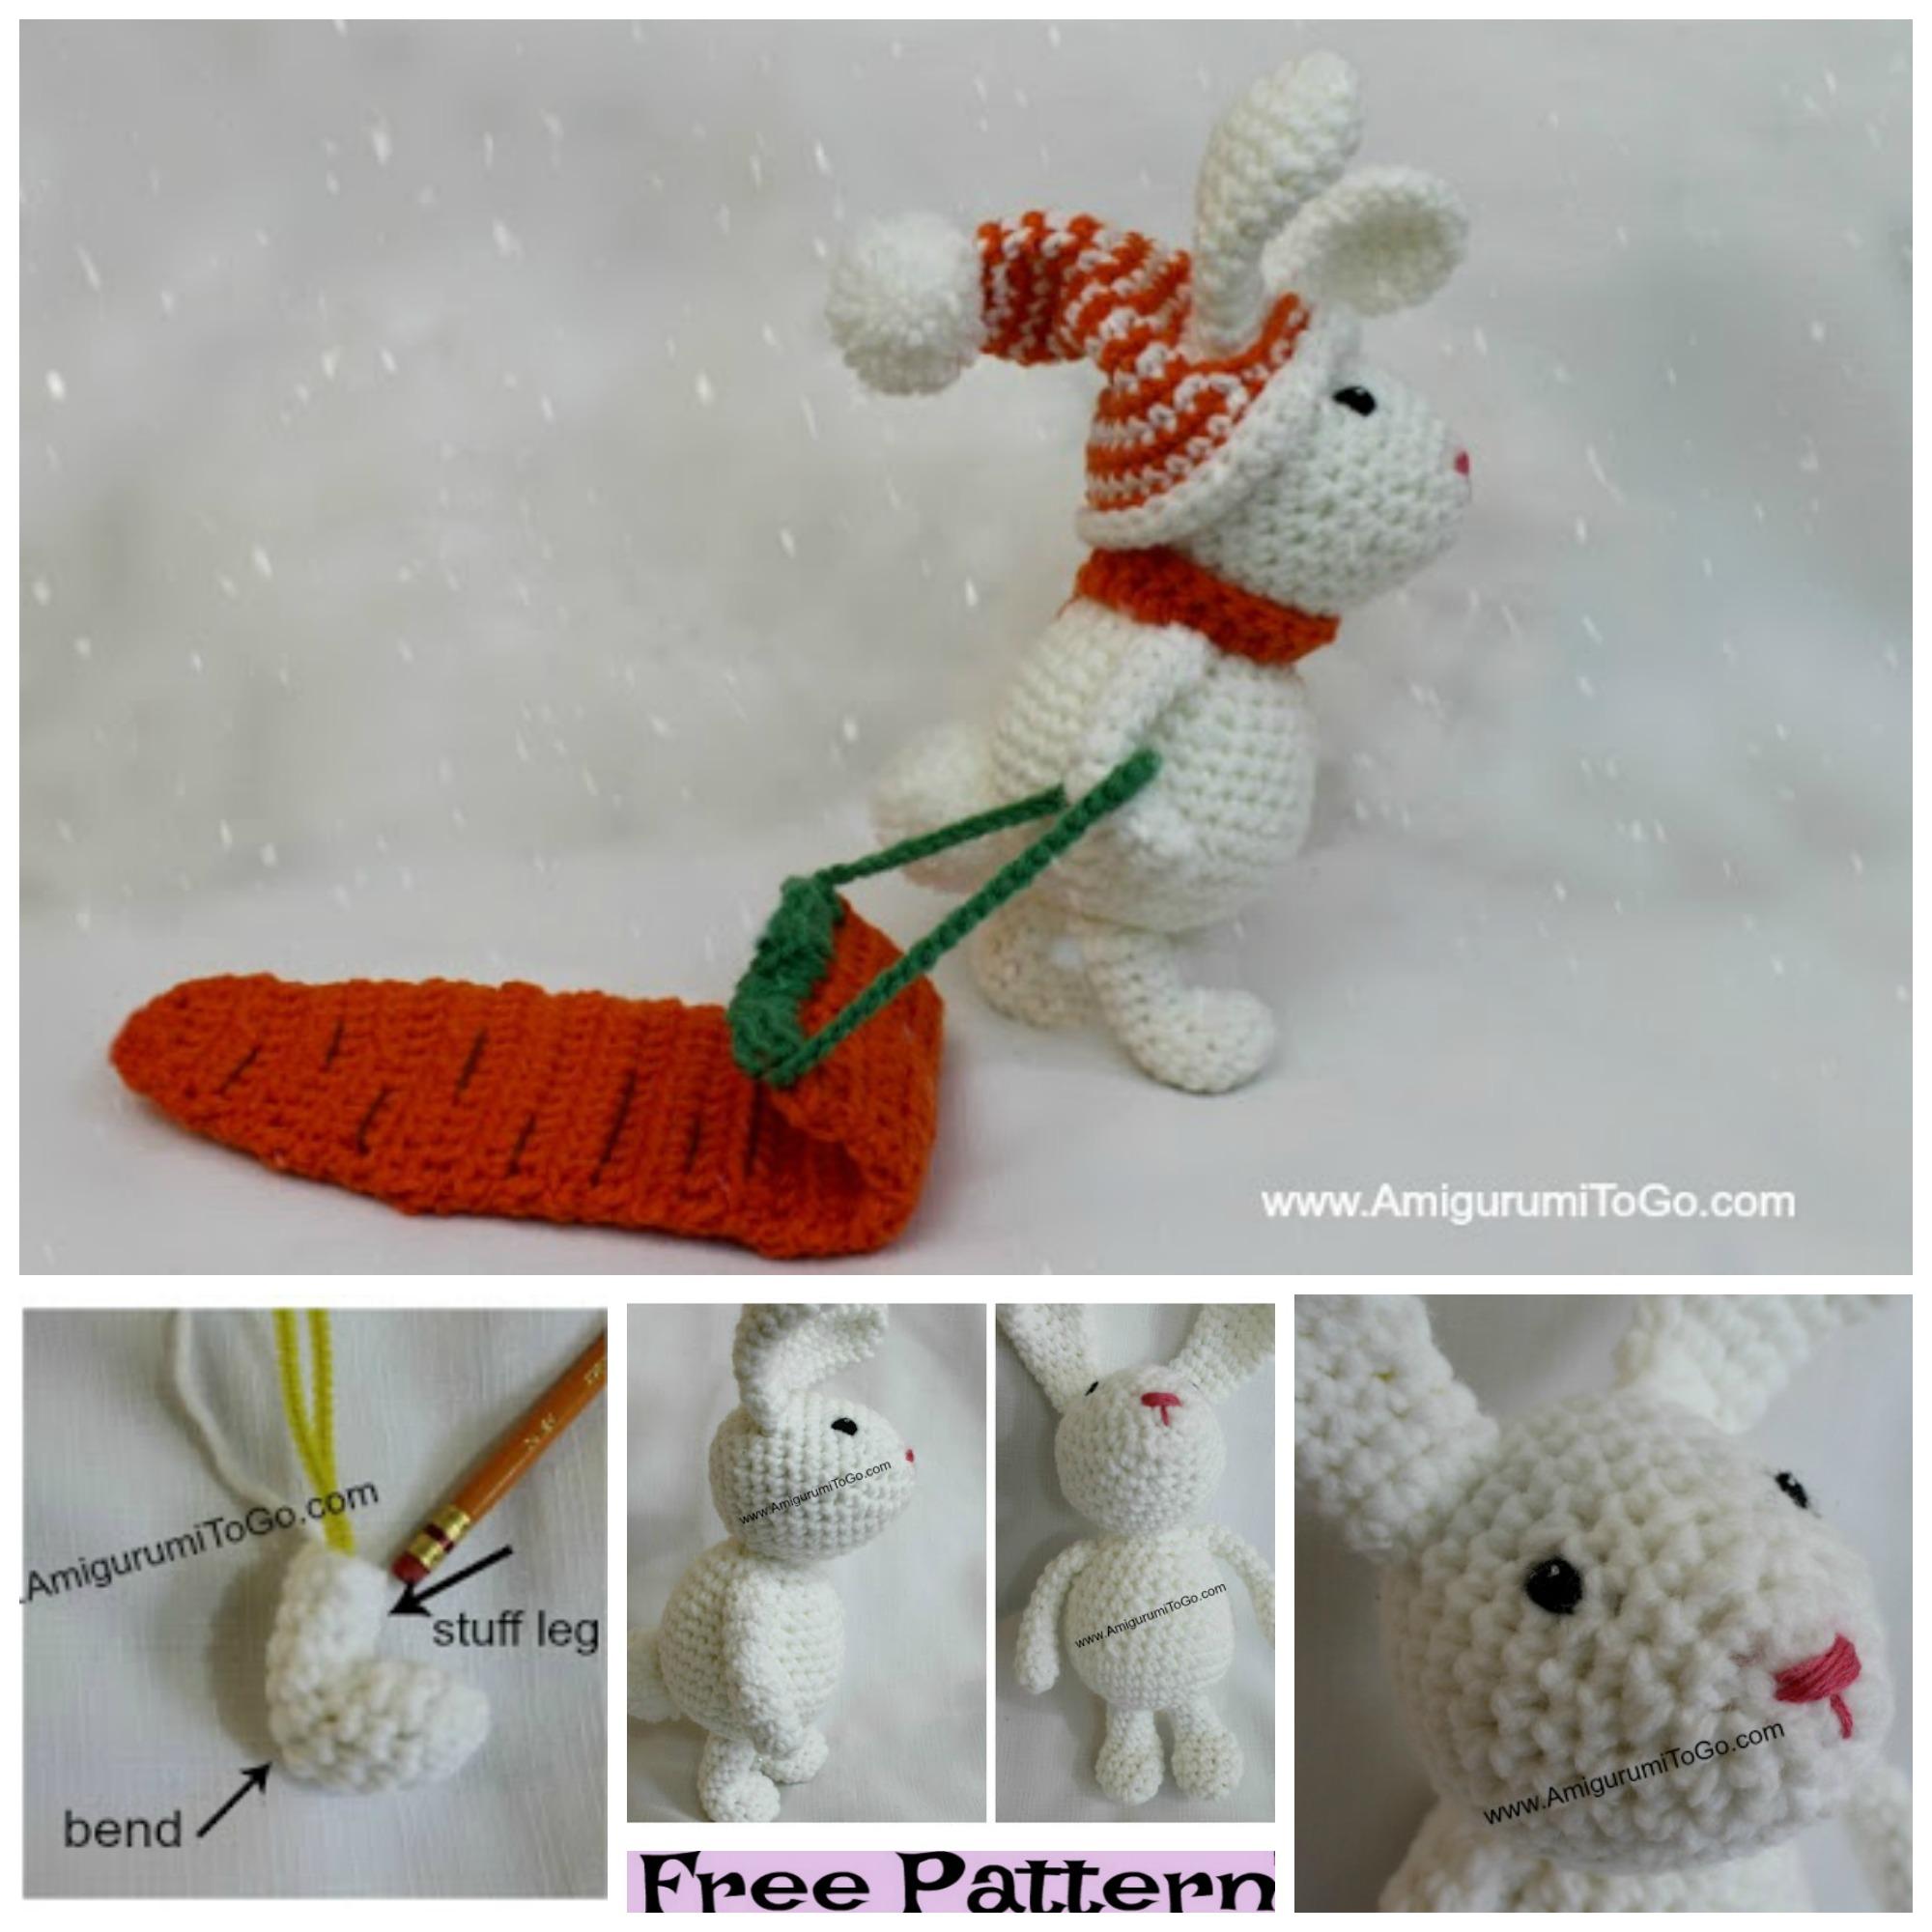 diy4ever-Crochet Snow Bunny - Free Patterns